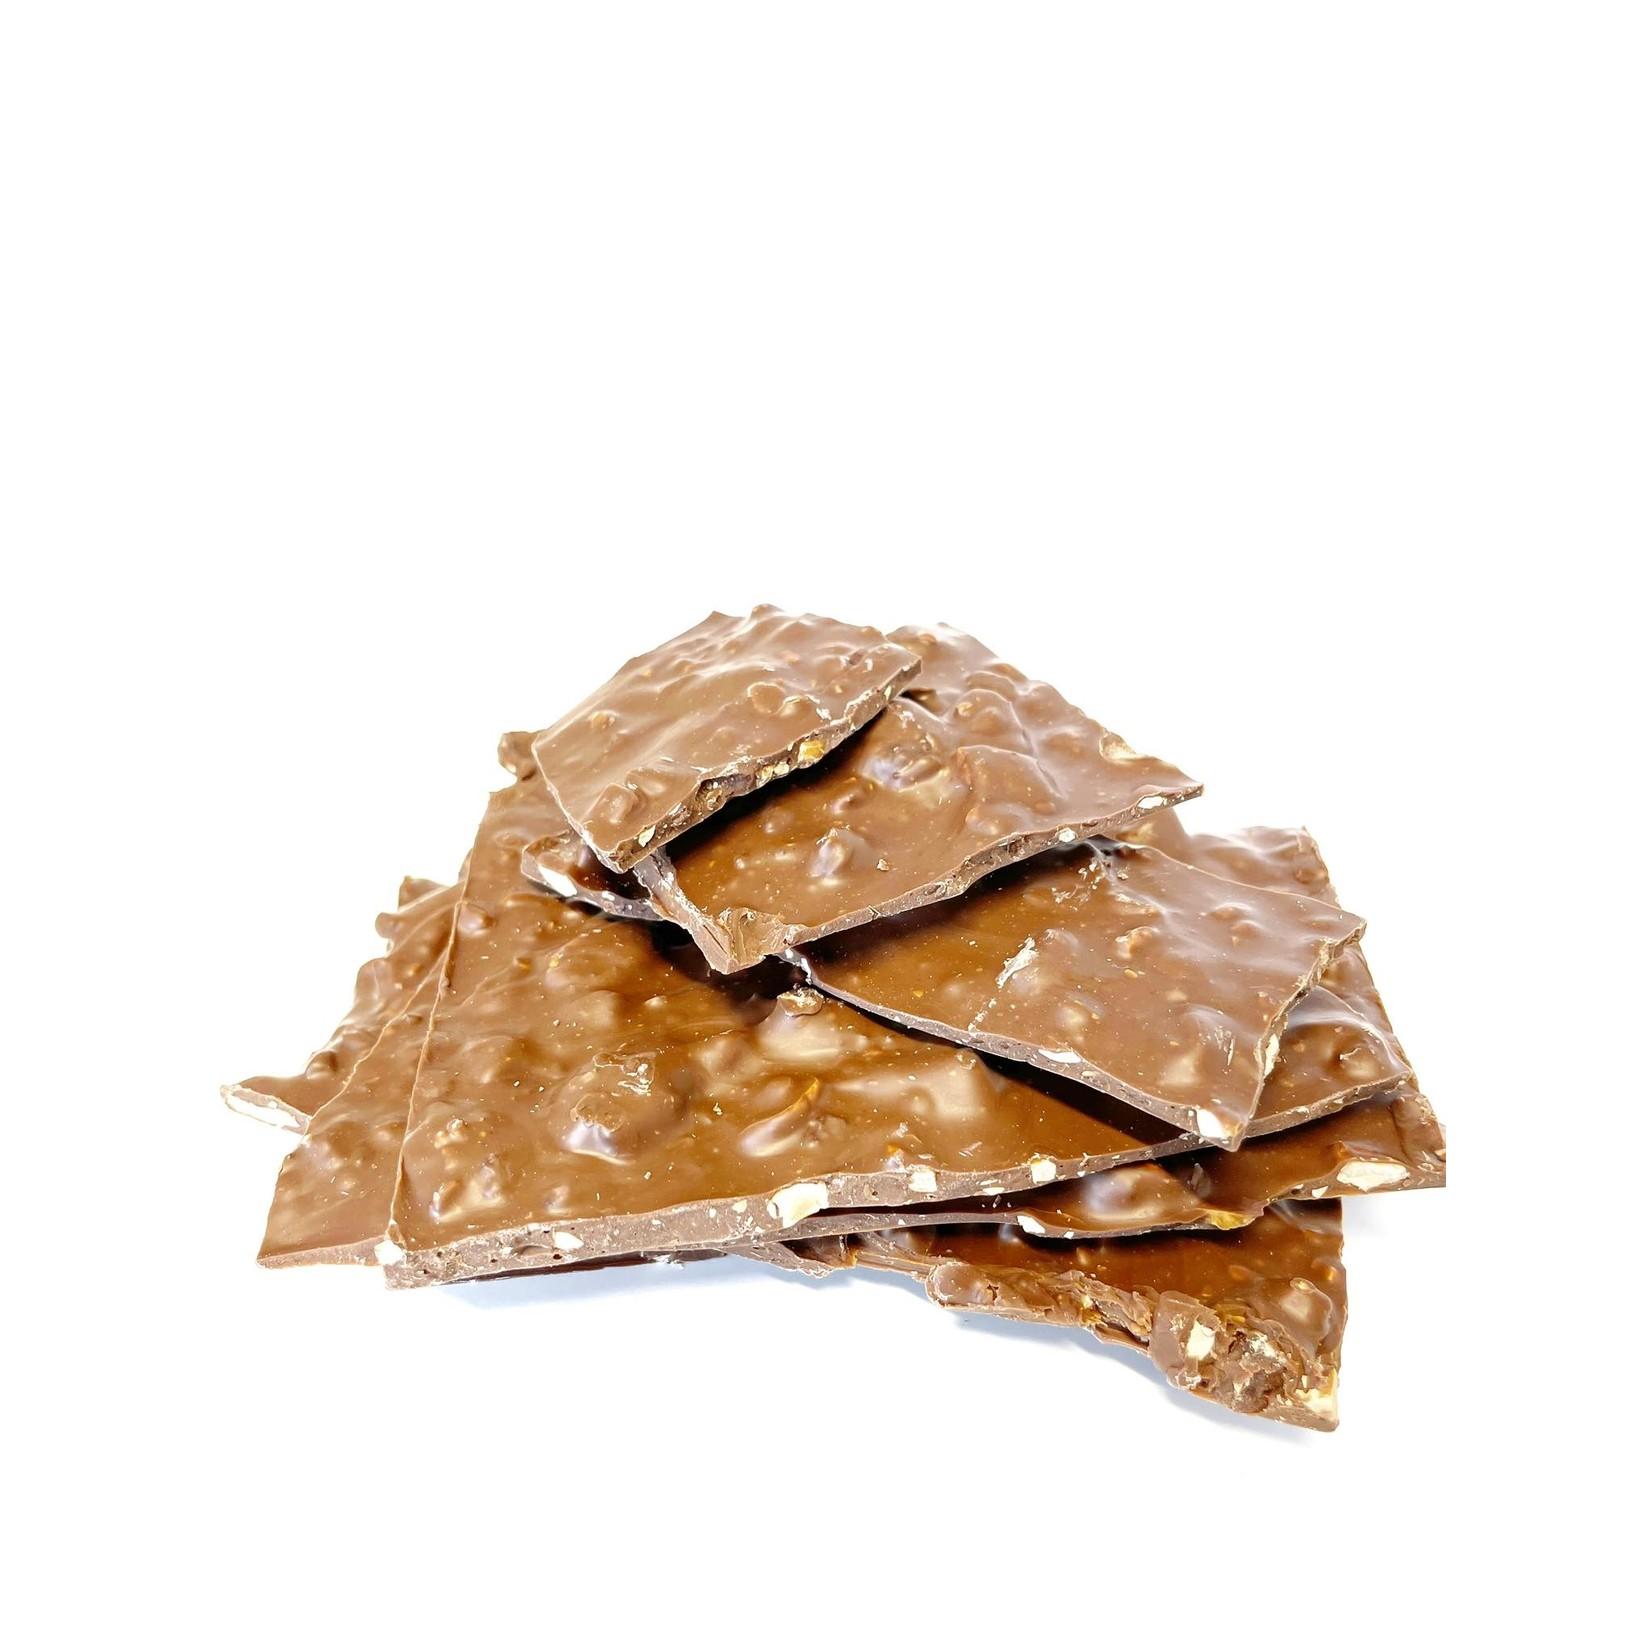 Blokchocolade Amandel Melk 400g